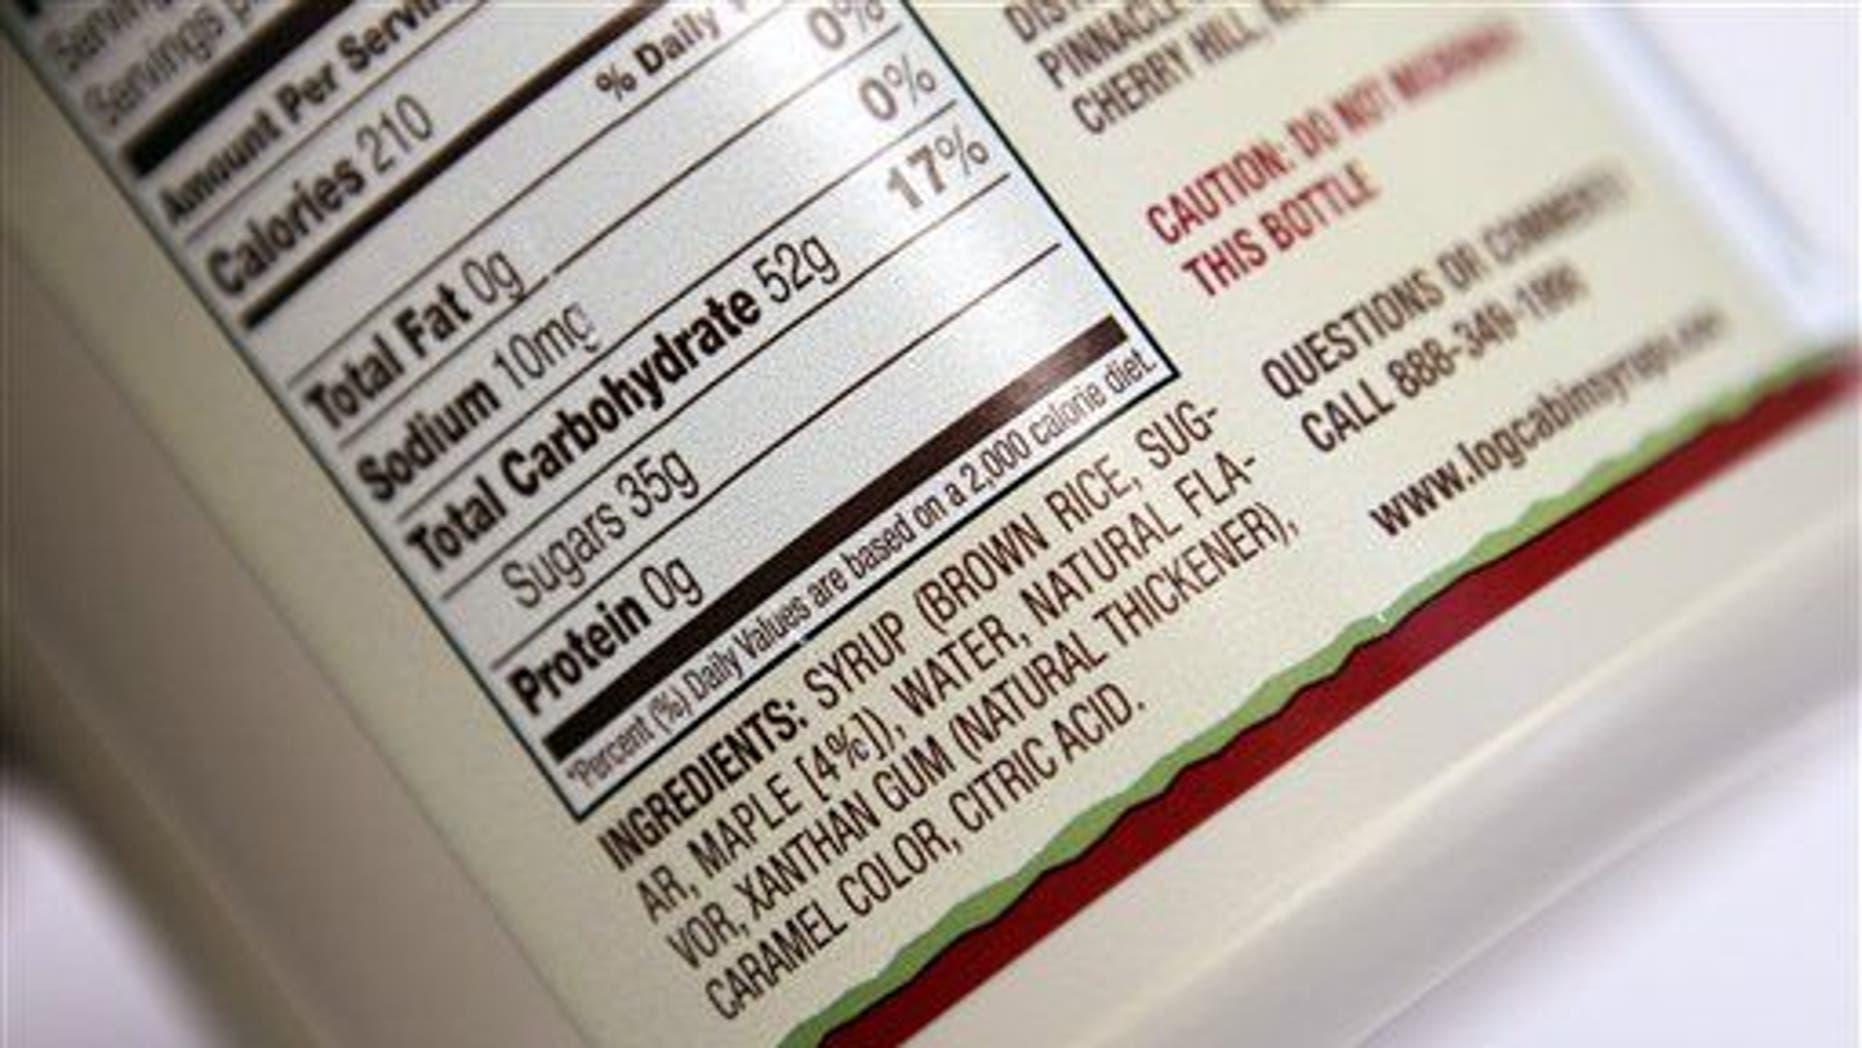 Natural flavor and citric acid are label no-nos, per Reid.